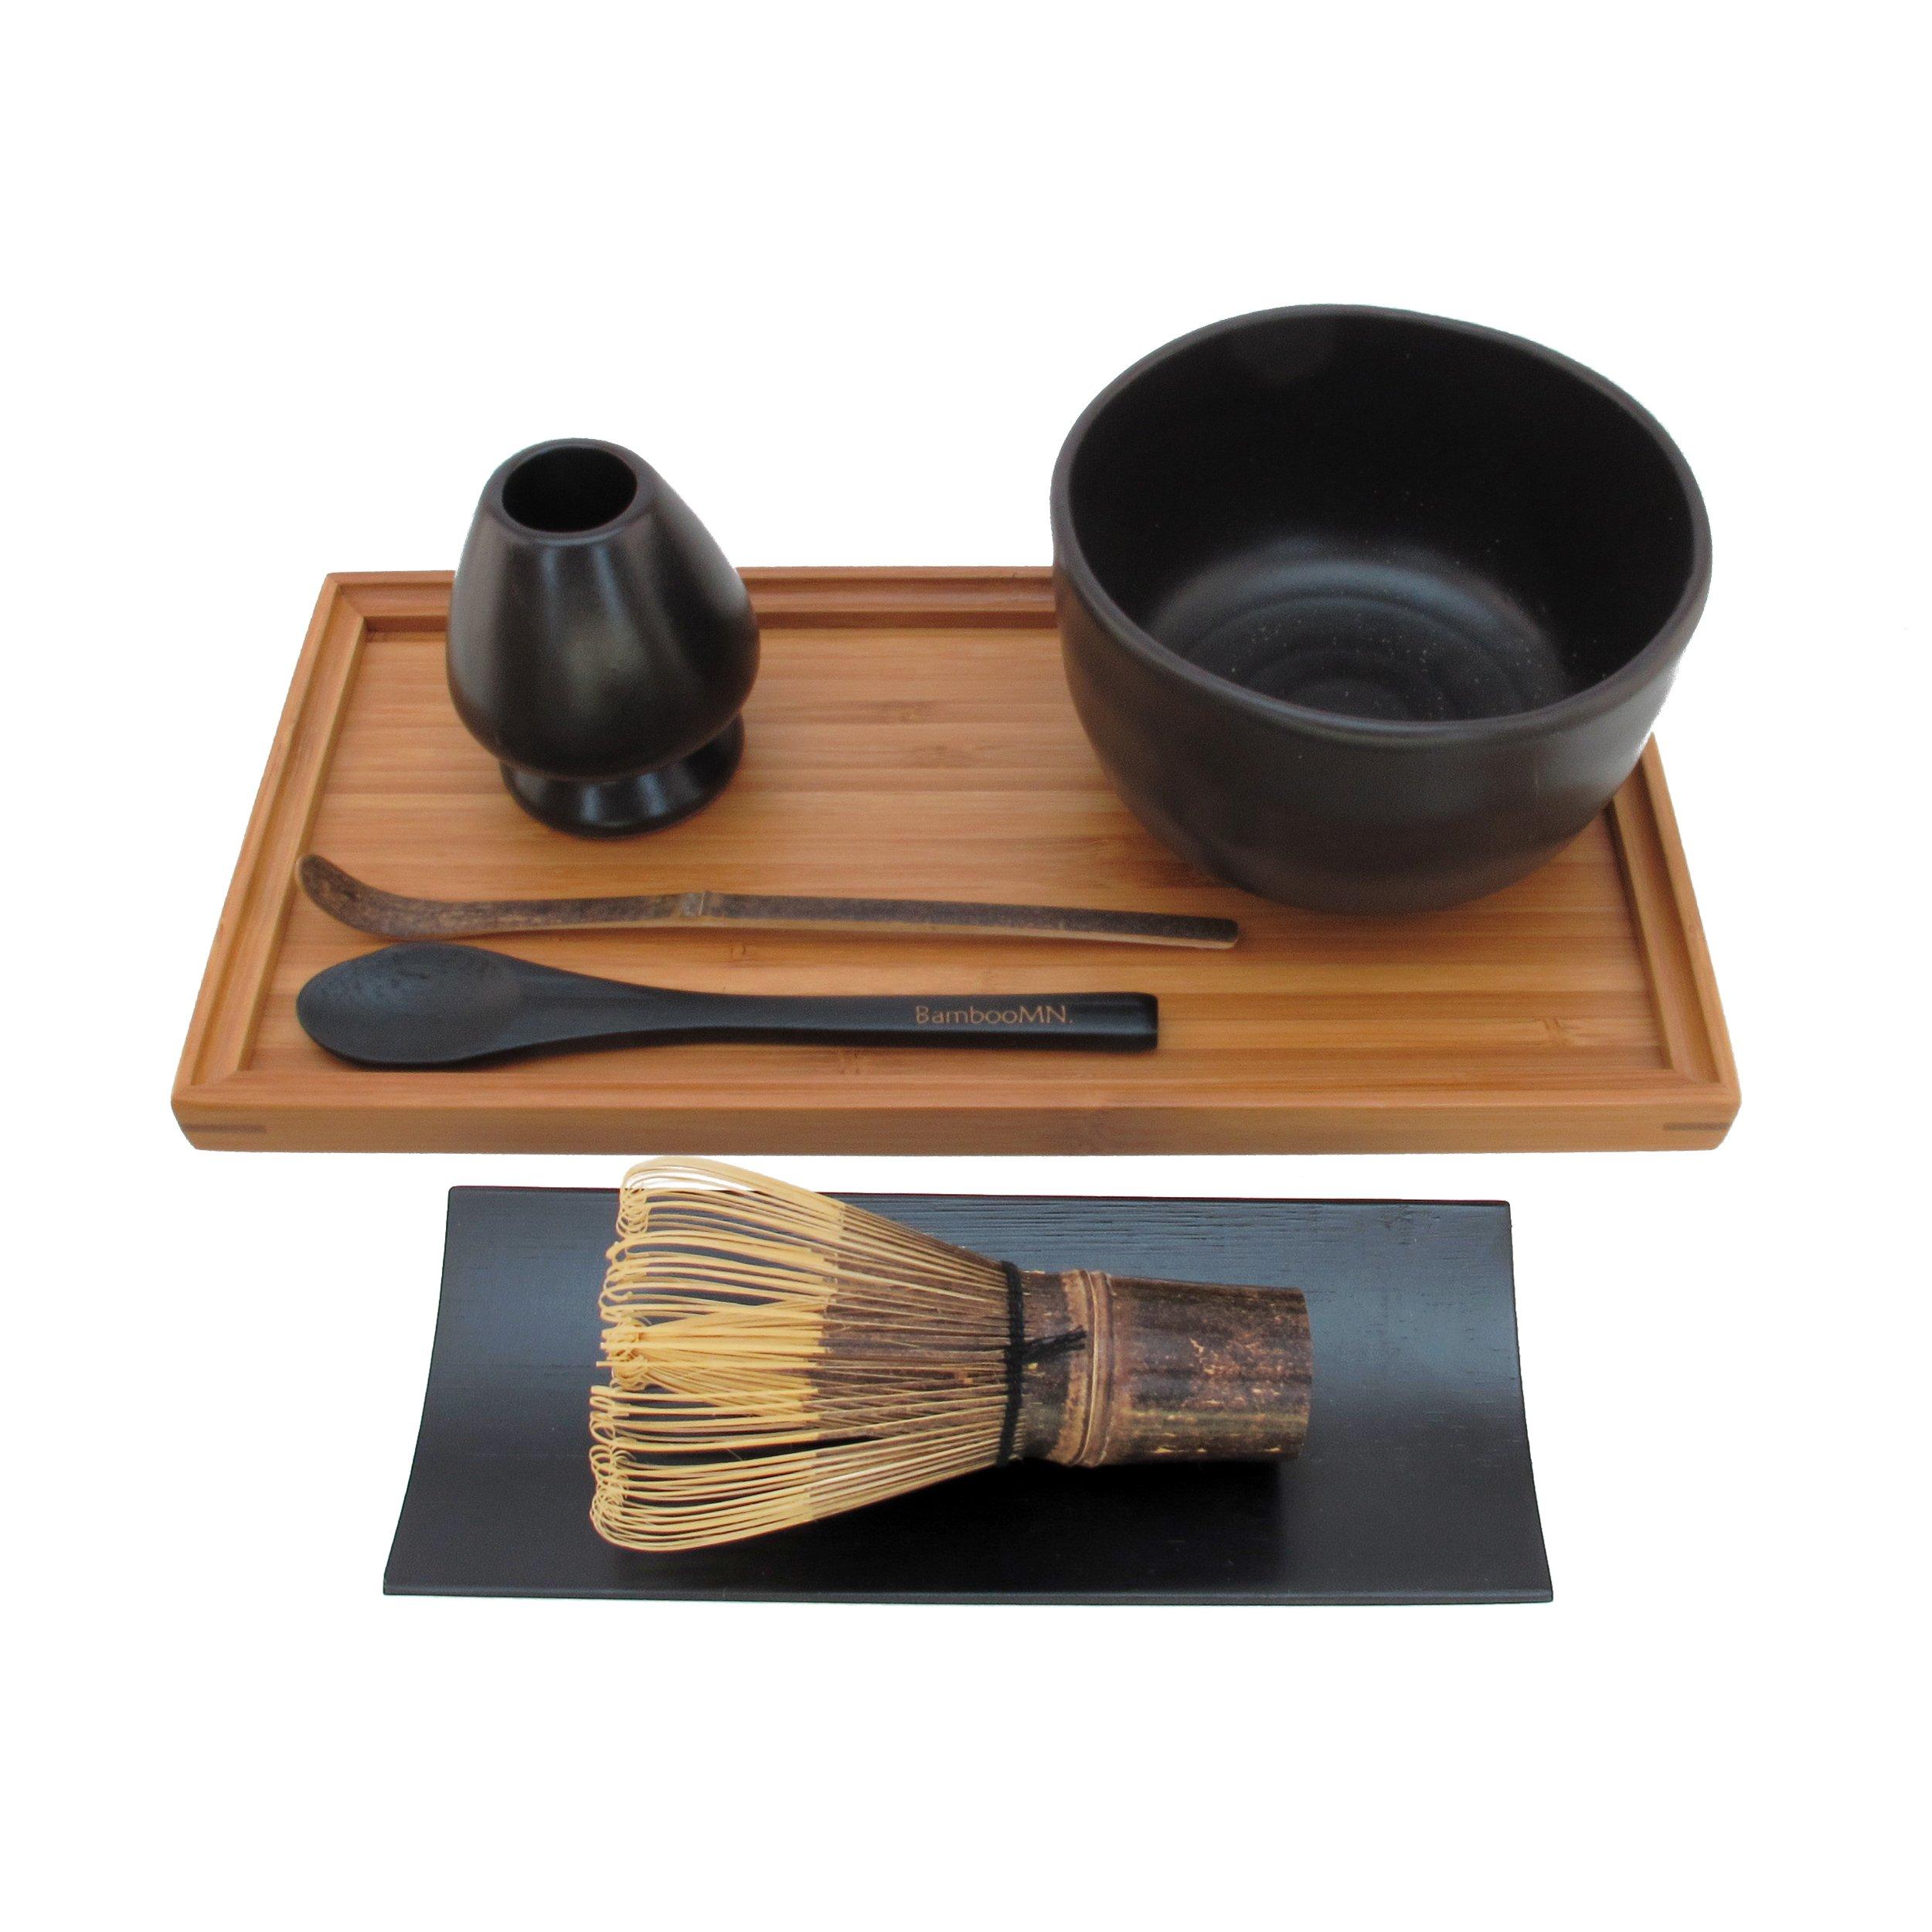 BambooMN Brand - Matcha Bowl Set (Includes Bowl, Rest, Black Tea Whisk, Black Chasaku, Black Tea Spoon, Rest Tray & Tray) - Black by BambooMN